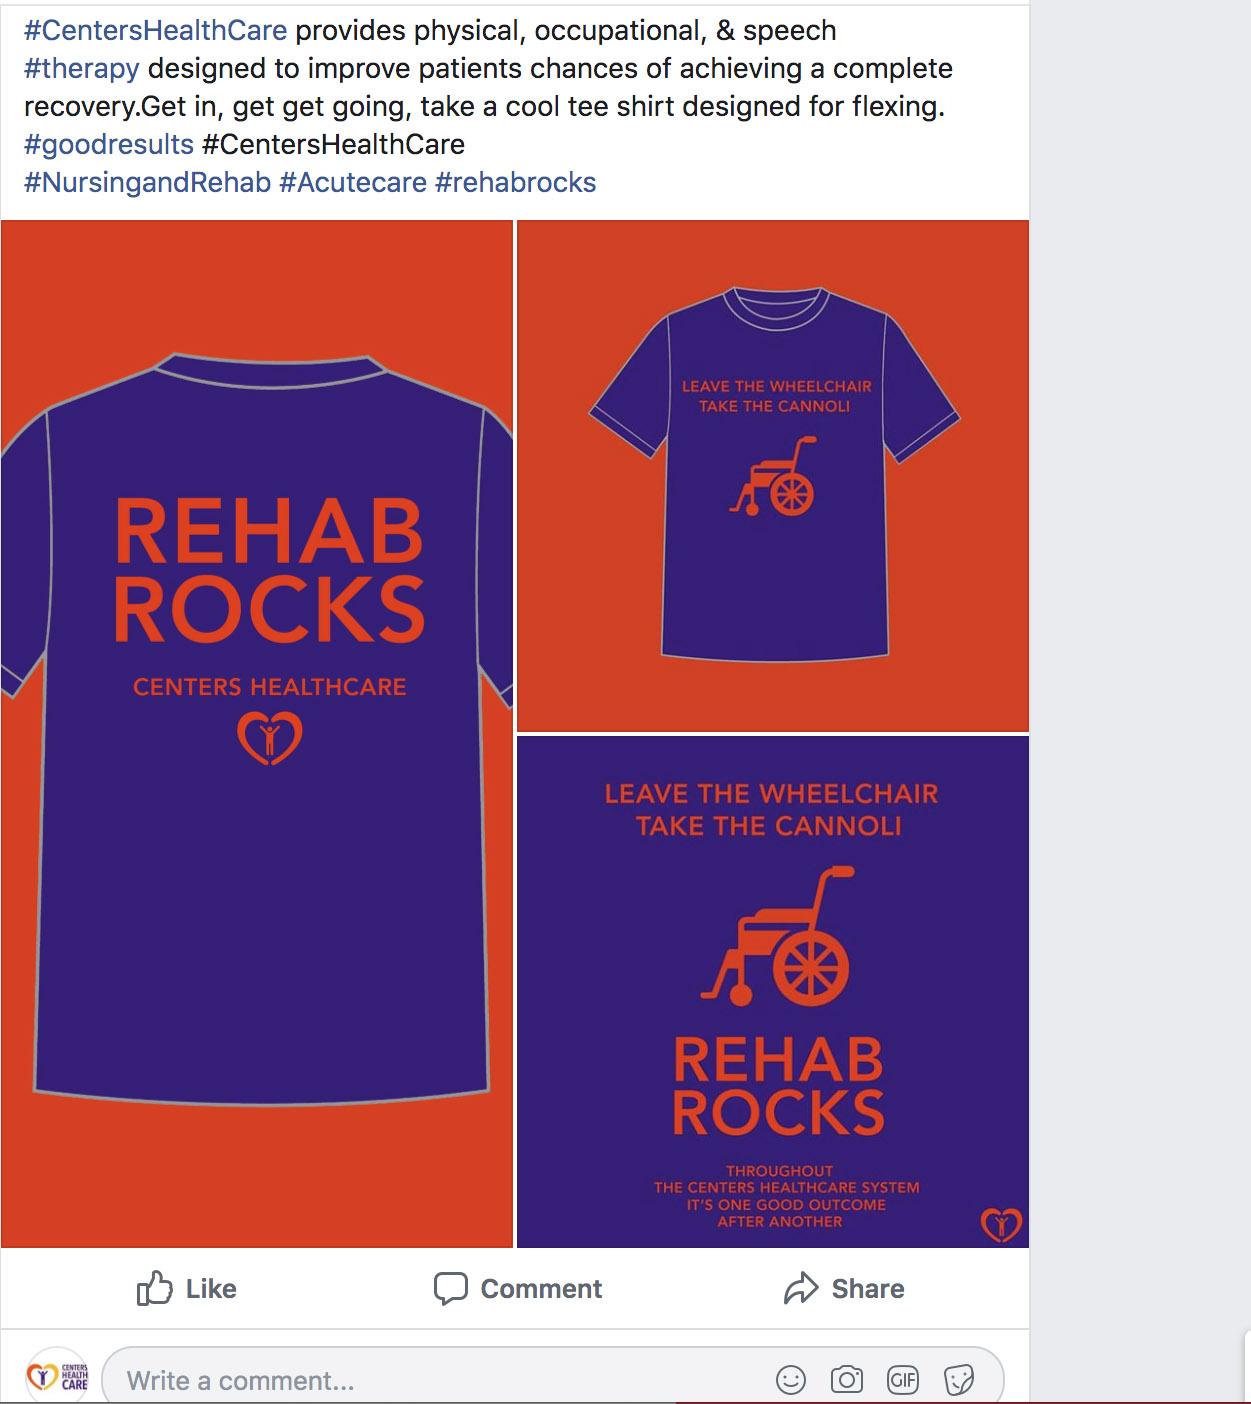 rehab rock centers health care